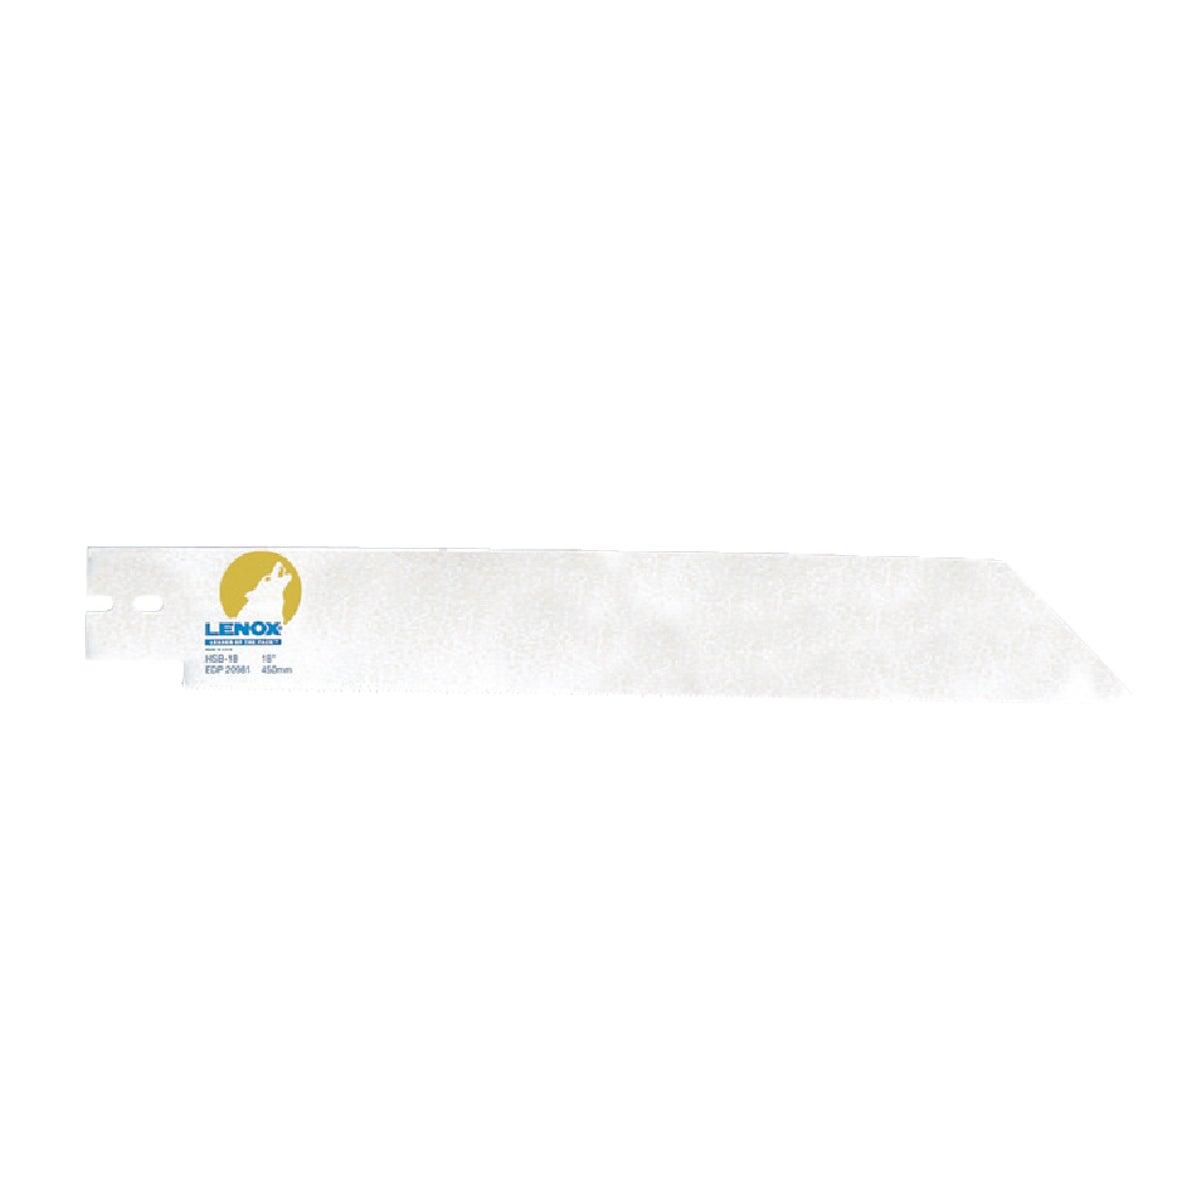 Lenox PVC/ABS BLADE HSB-18